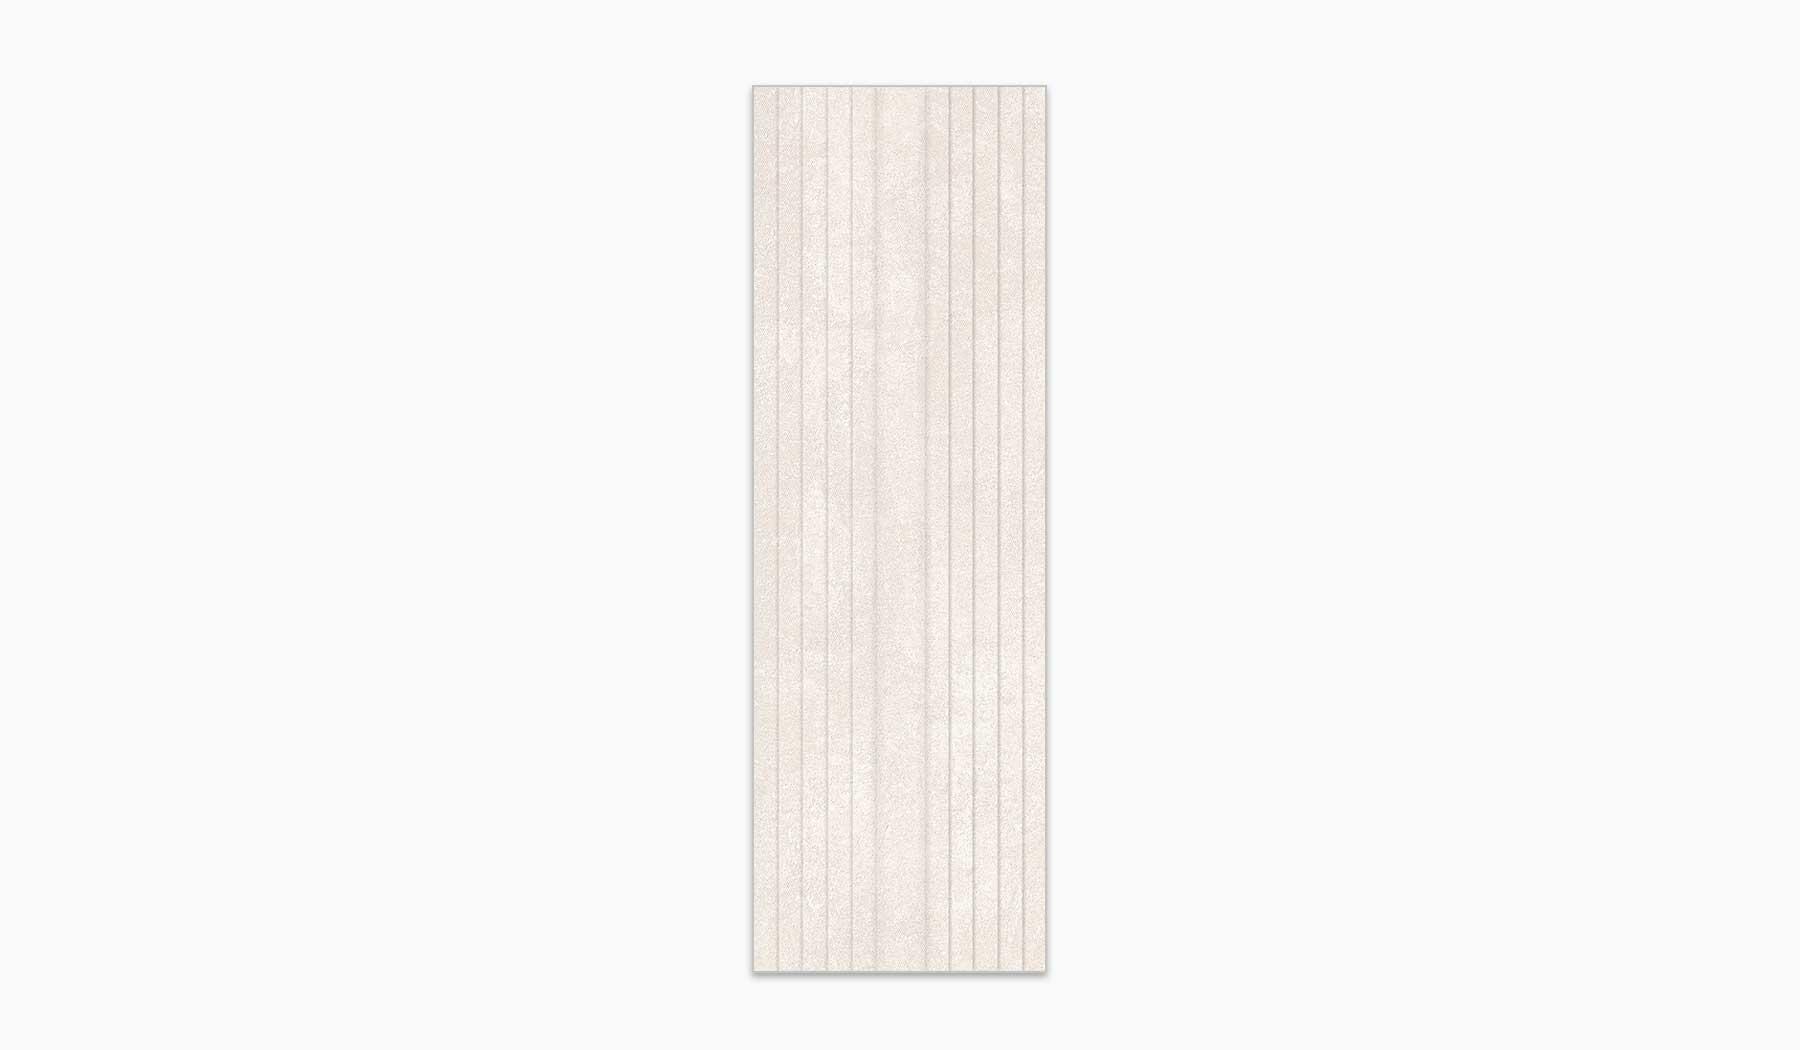 boom ceramic , Wall Tile Mersala Decor , Dark Cream Cement texture , Matt Punch in size 90*30